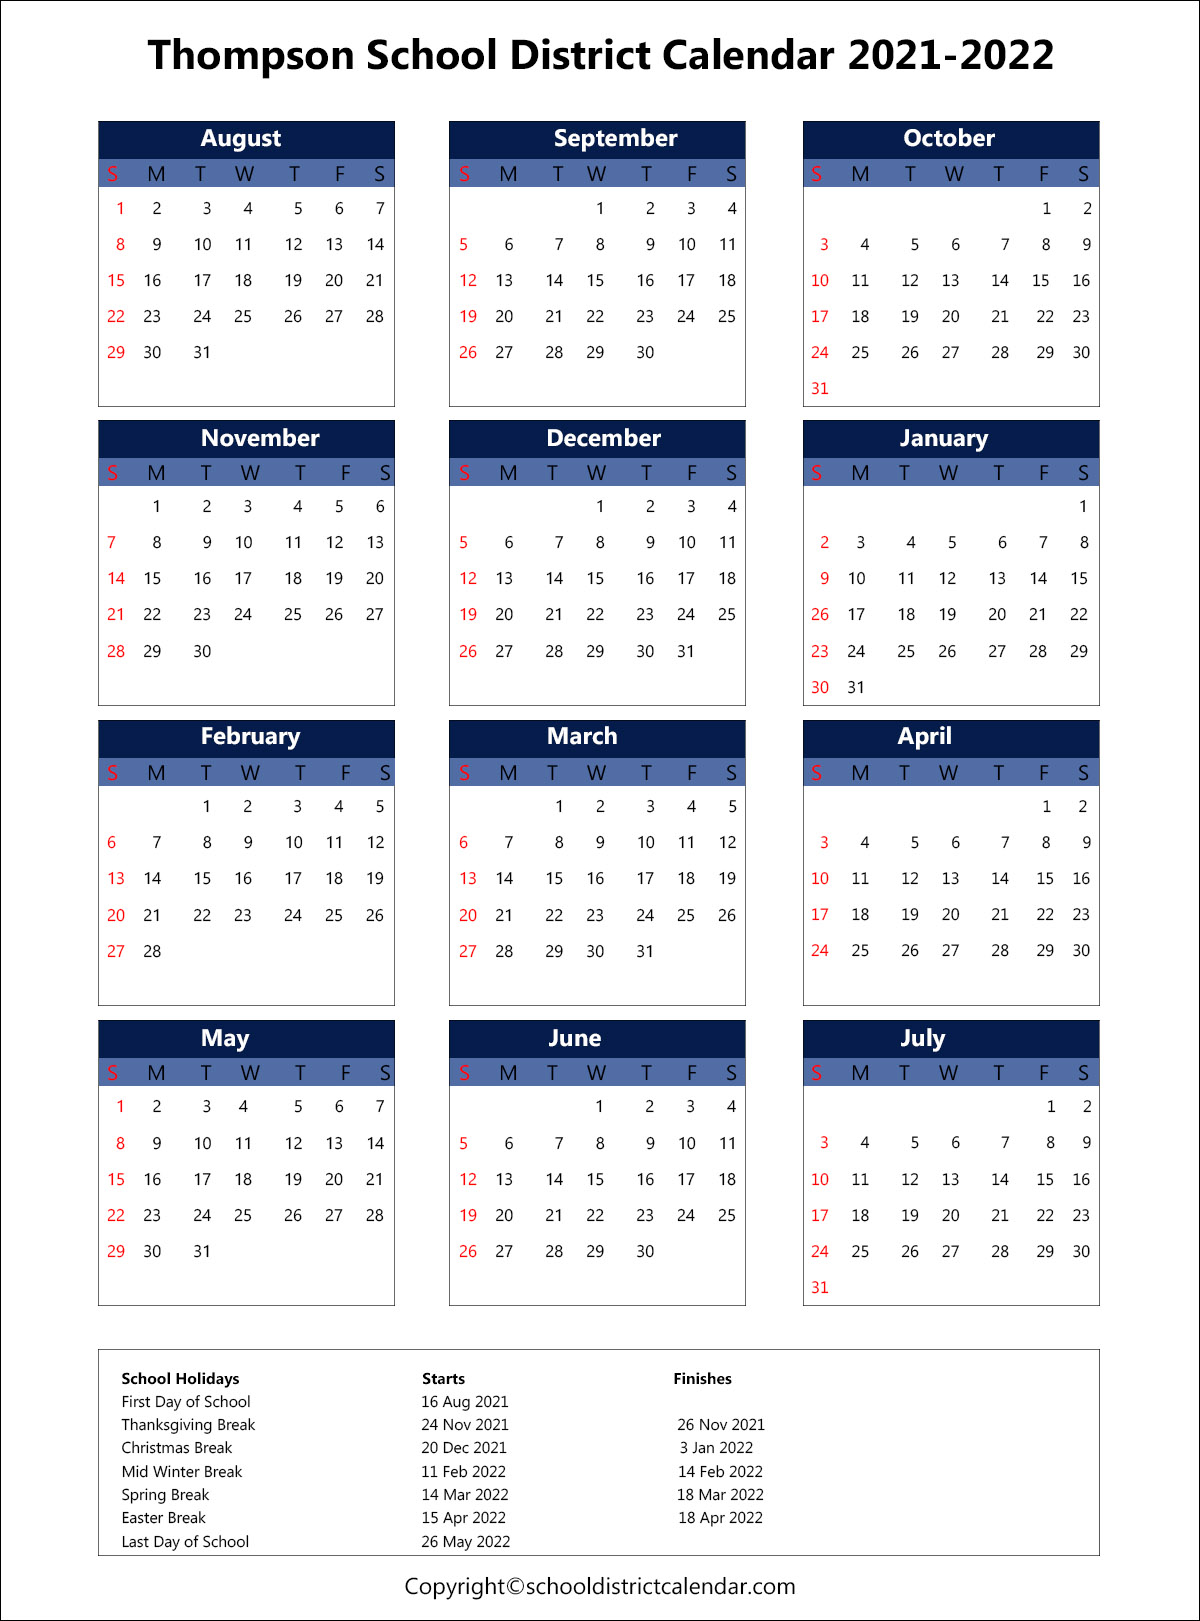 Thompson School District Calendar 2021